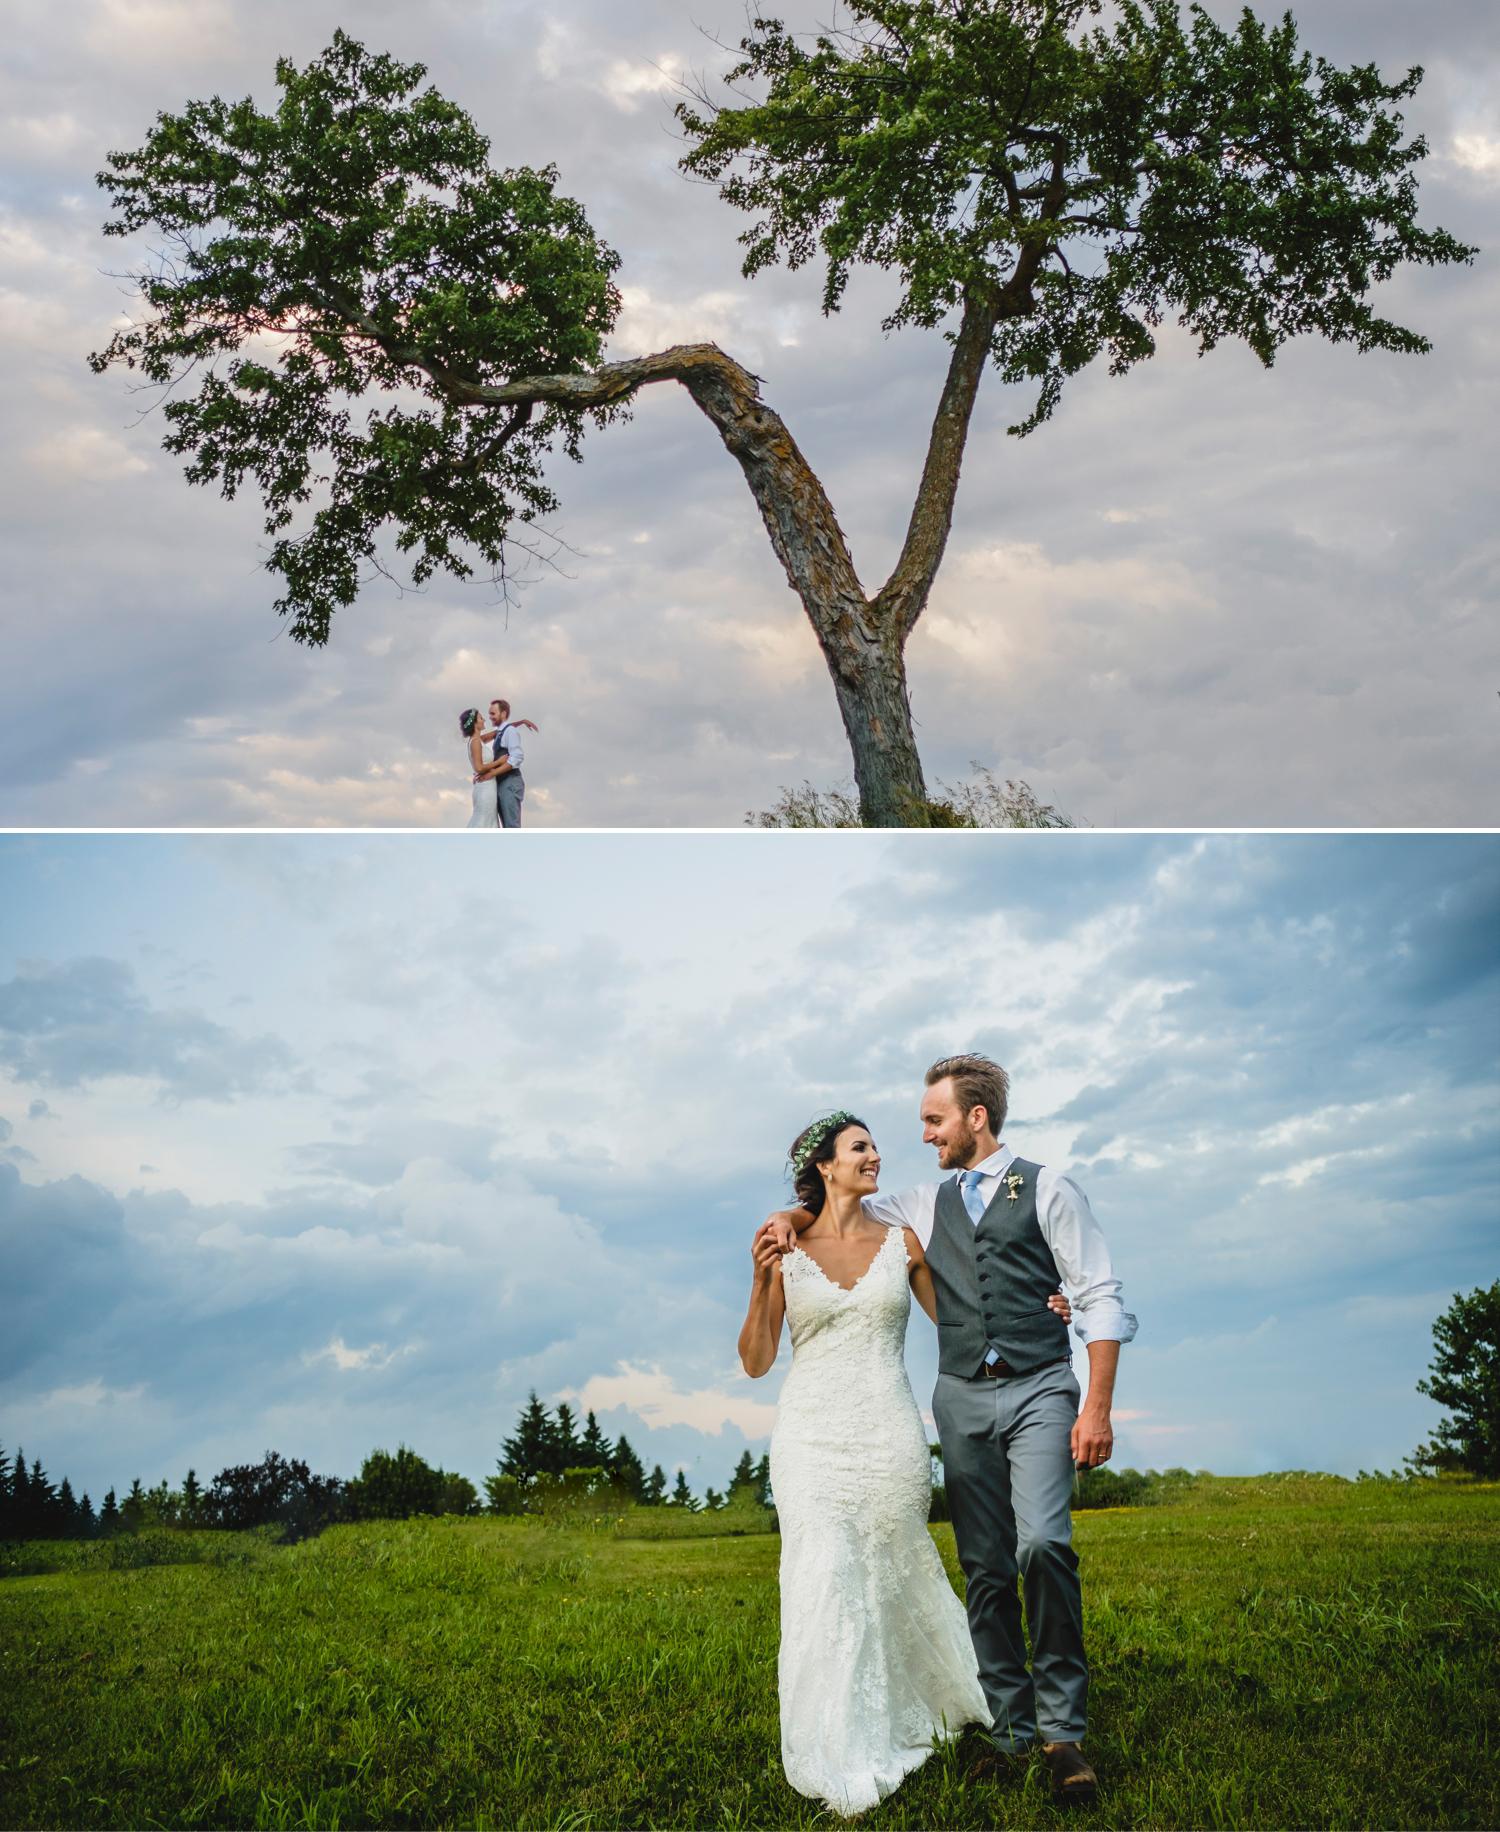 bride and groom sunset photos during a metcalfe ontario wedding reception